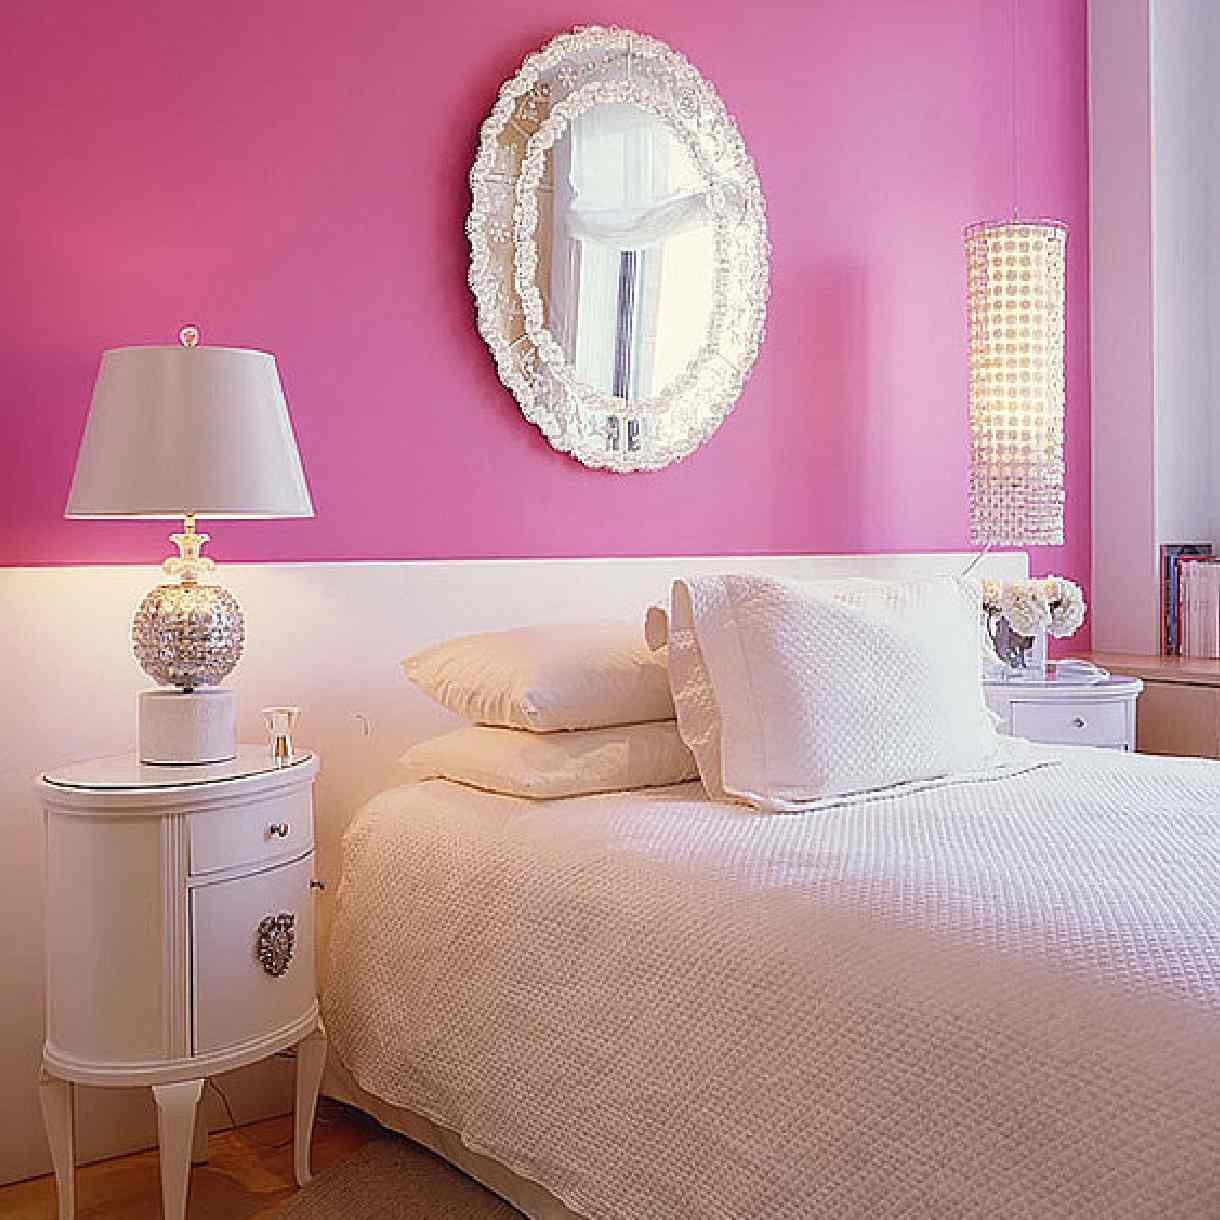 pink-interior-design-beautiful-pink-bedroom-interior-design-60386.jpg